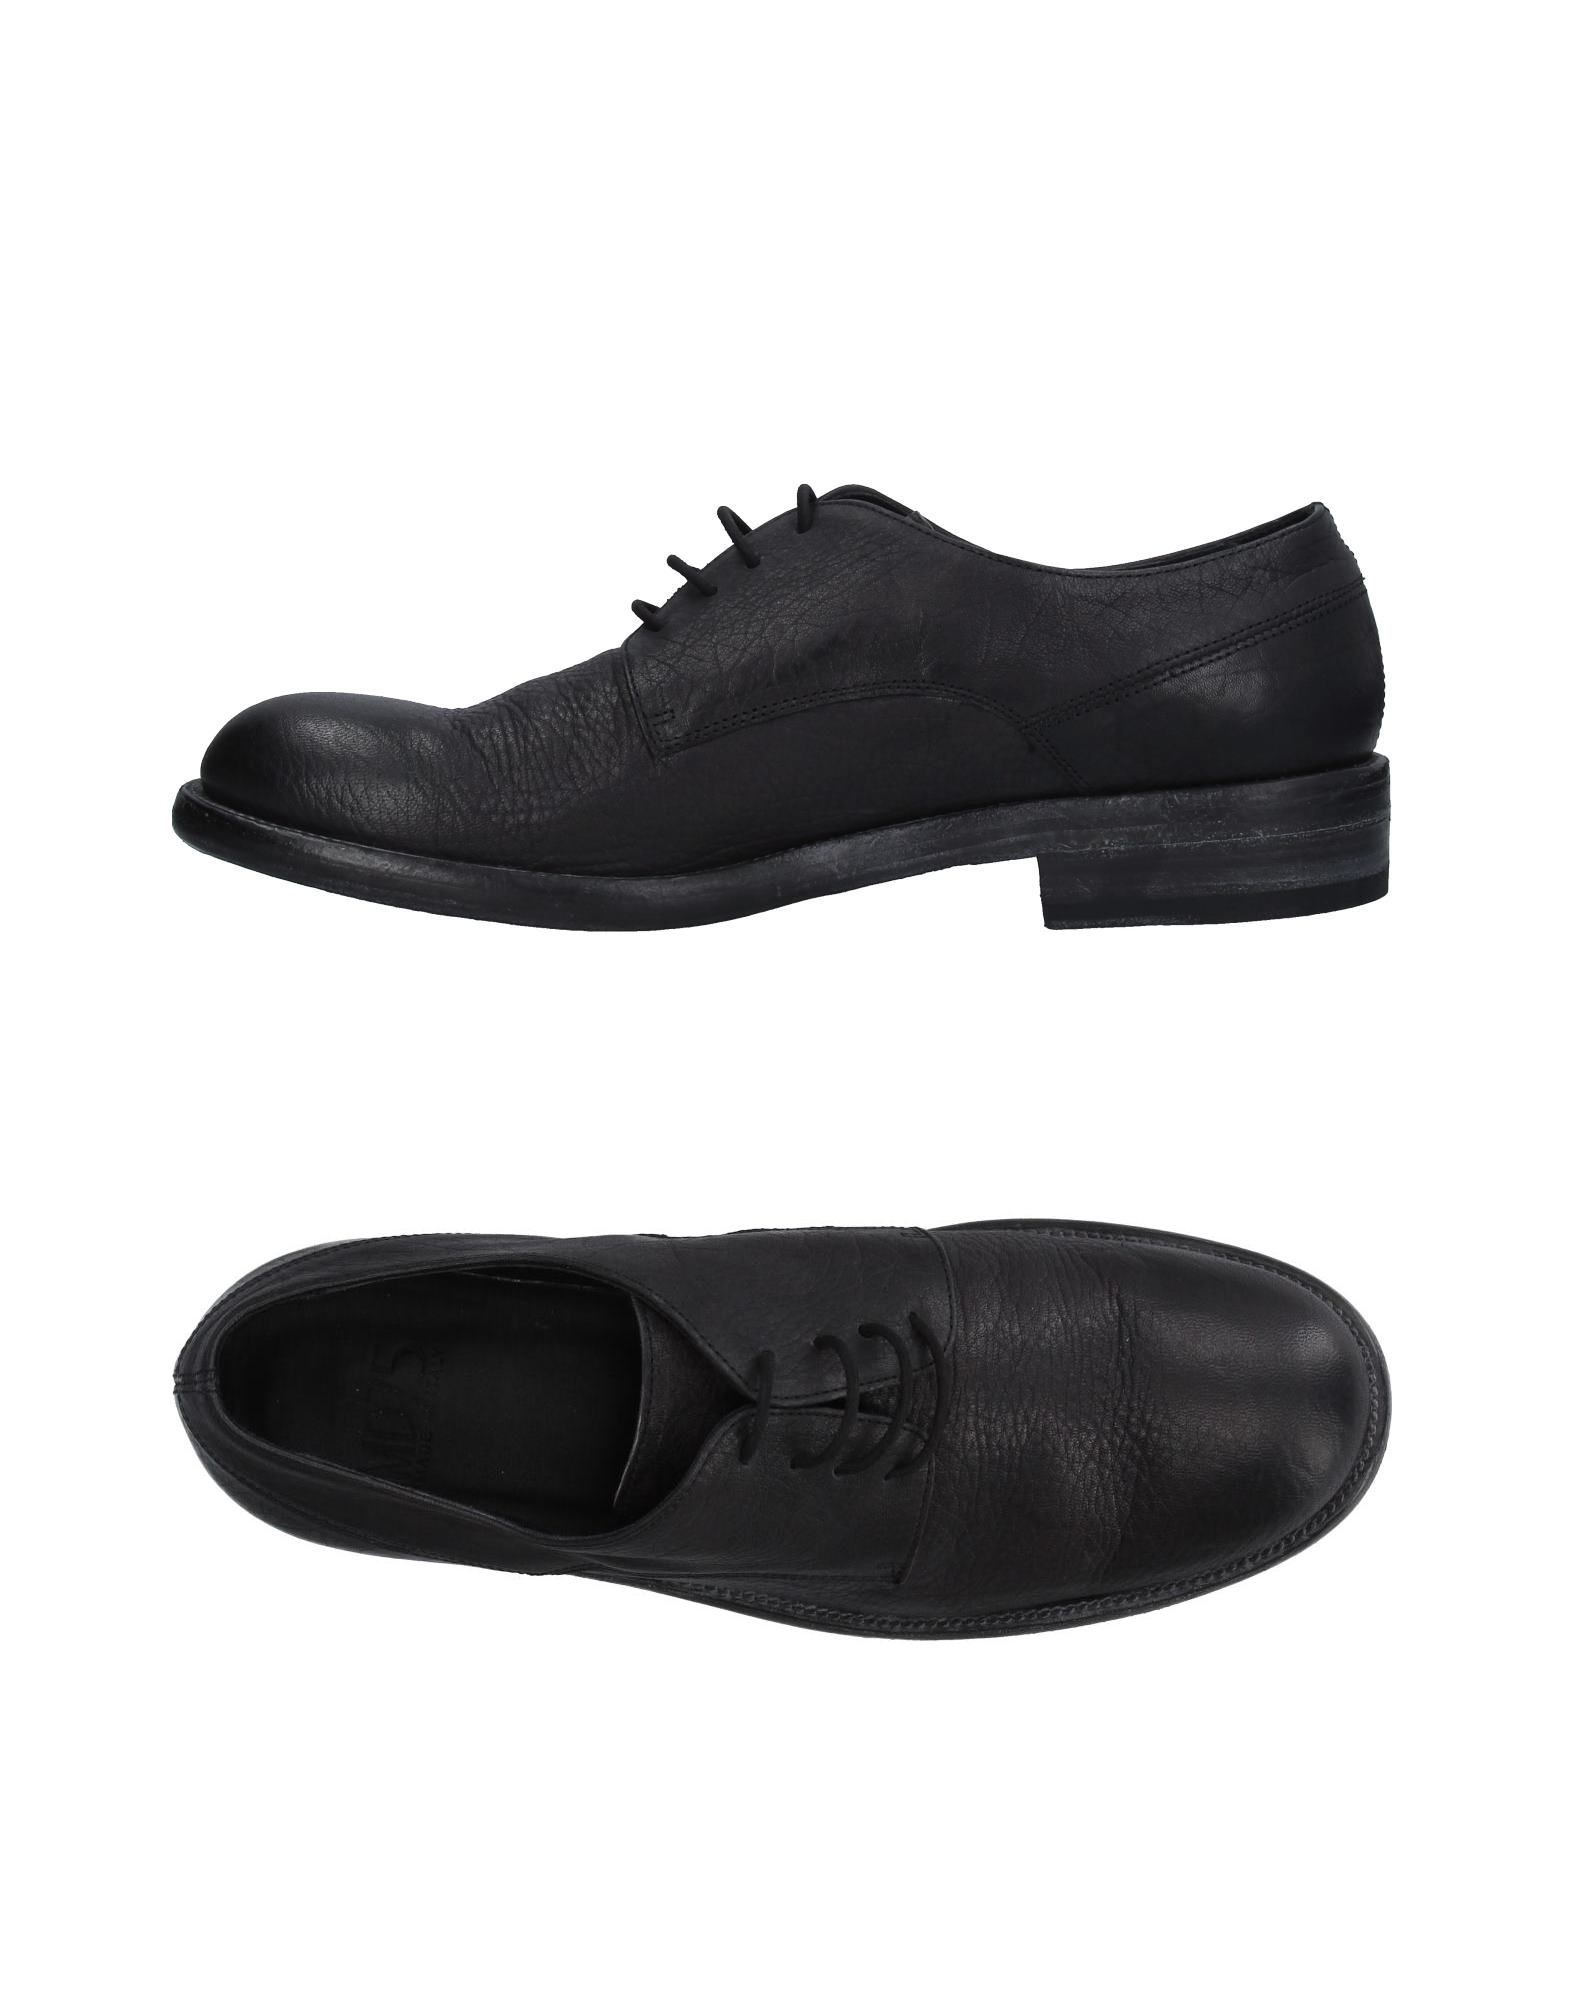 Md 75 75 75 Schnürschuhe Herren  11230037AB Neue Schuhe ec42a8